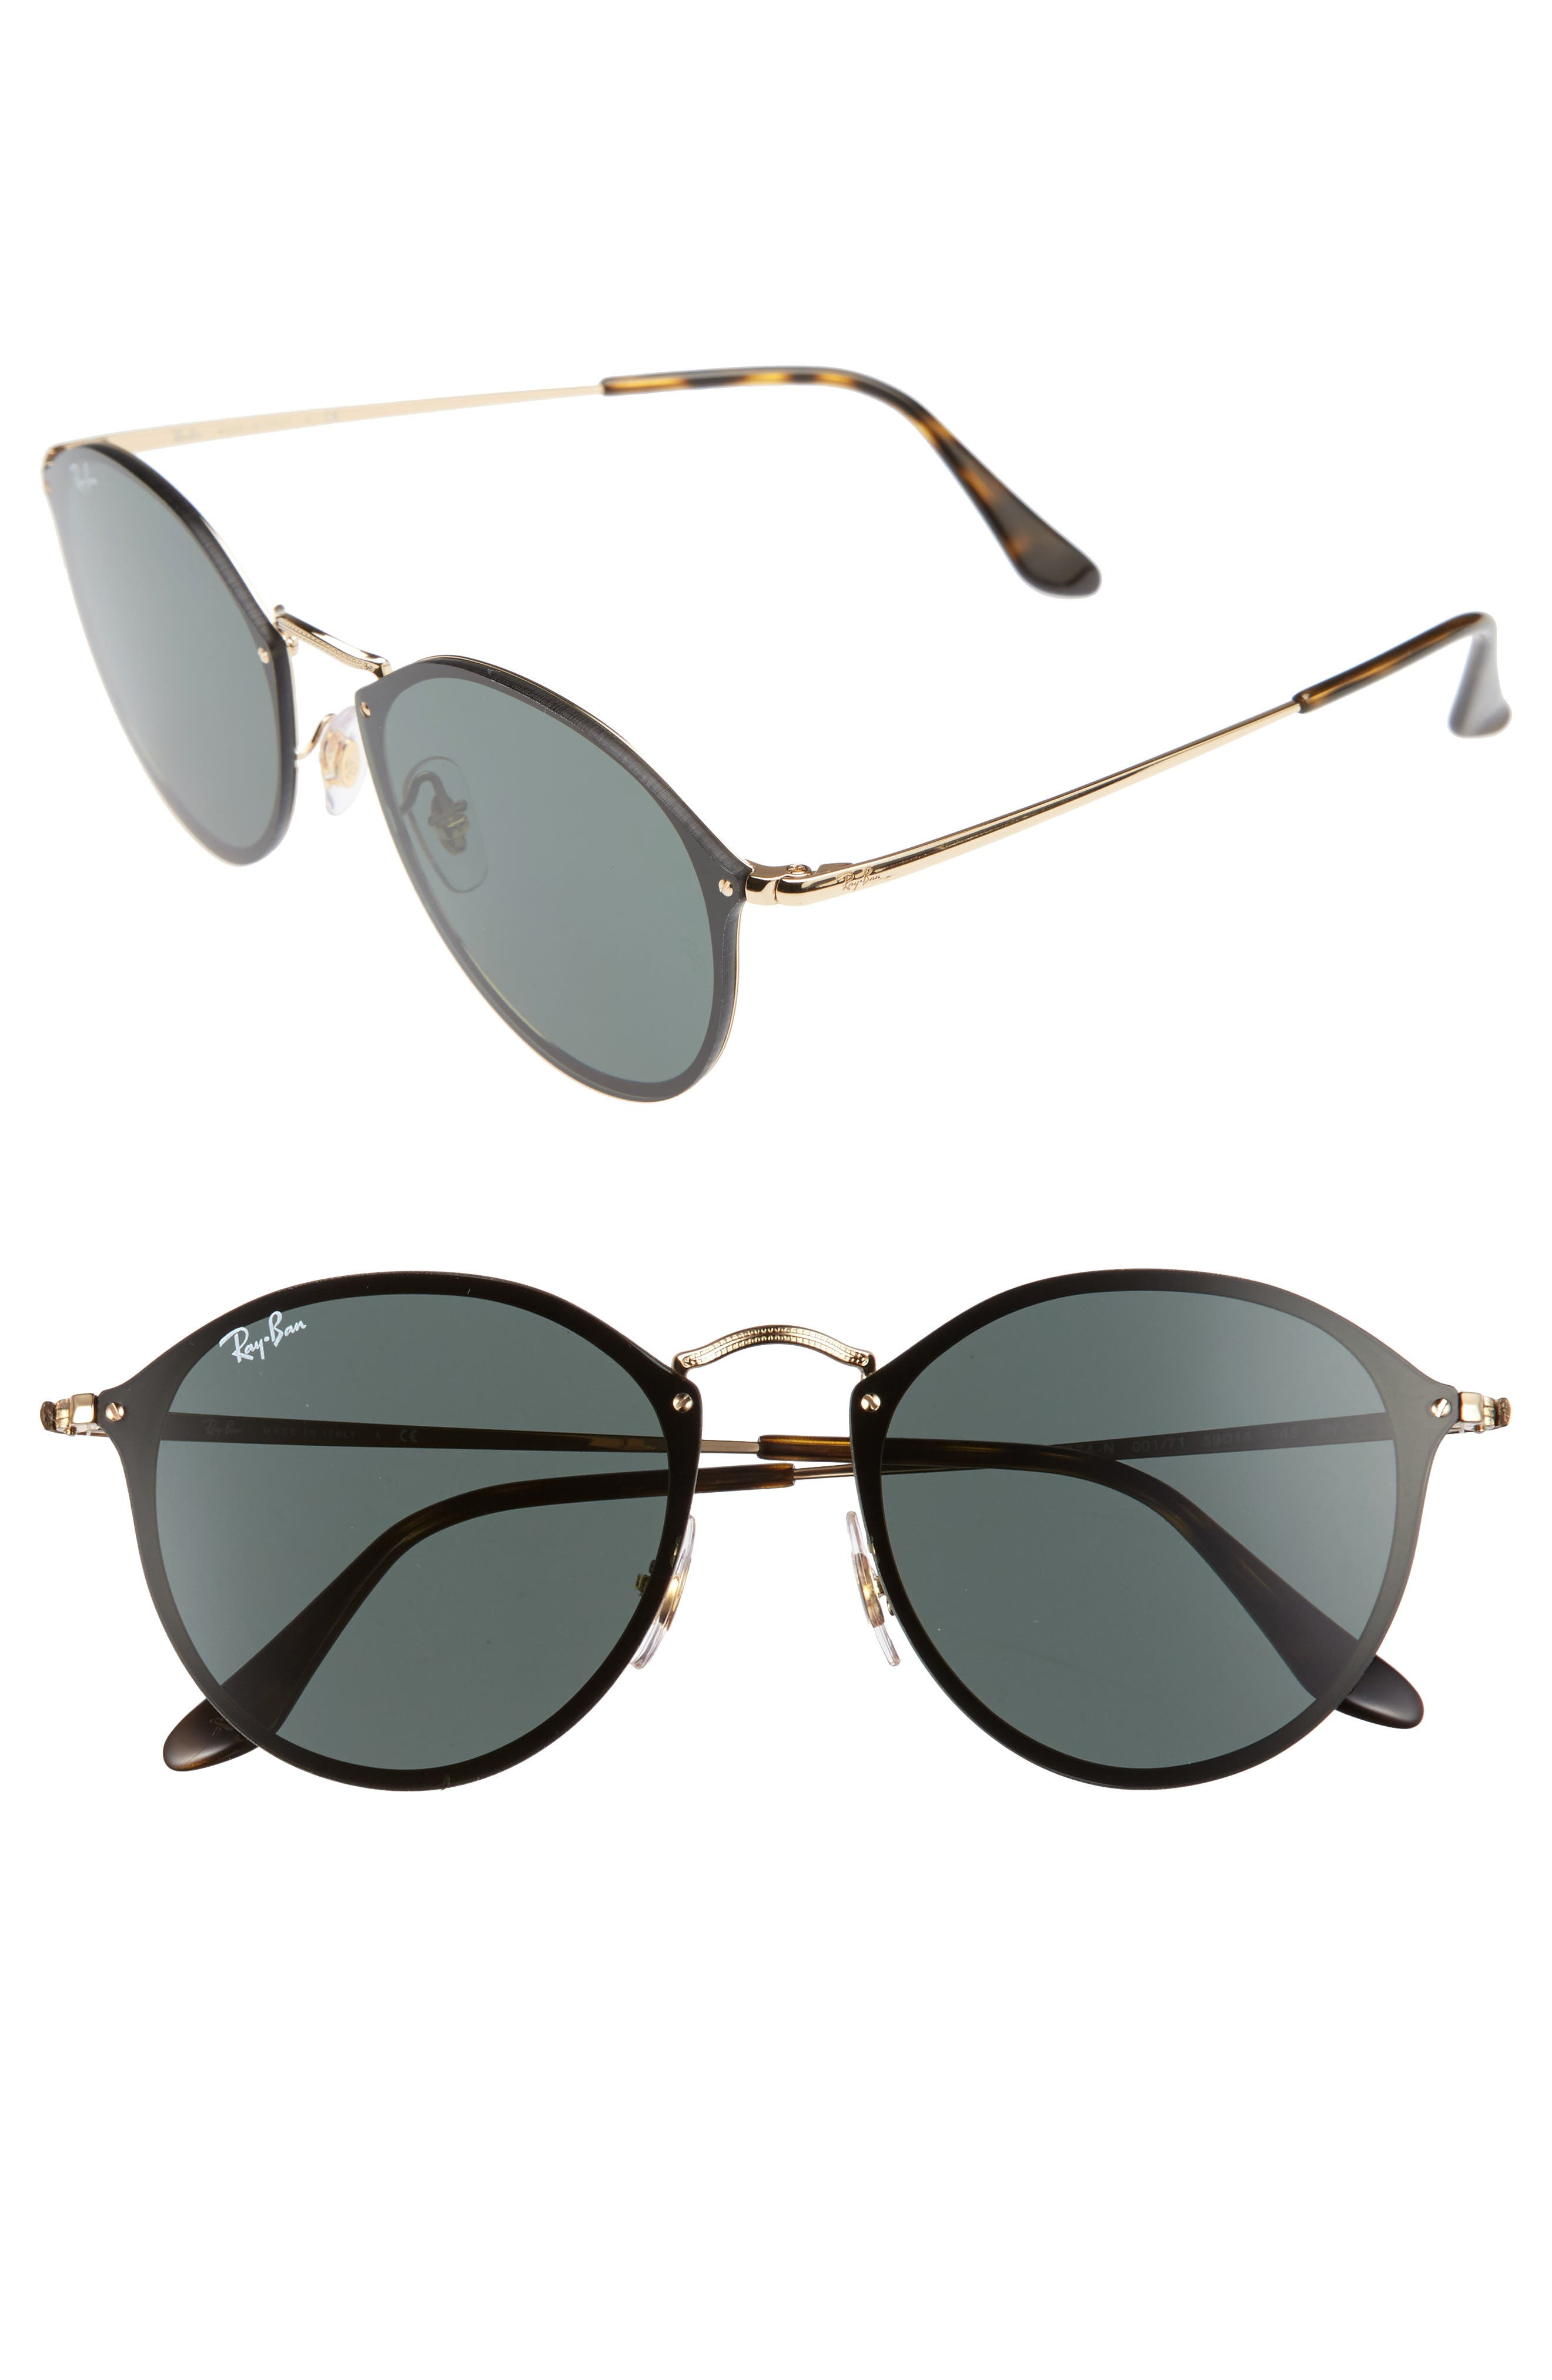 Ray-Ban Blaze 5m Round Sunglasses - Gold/ Green